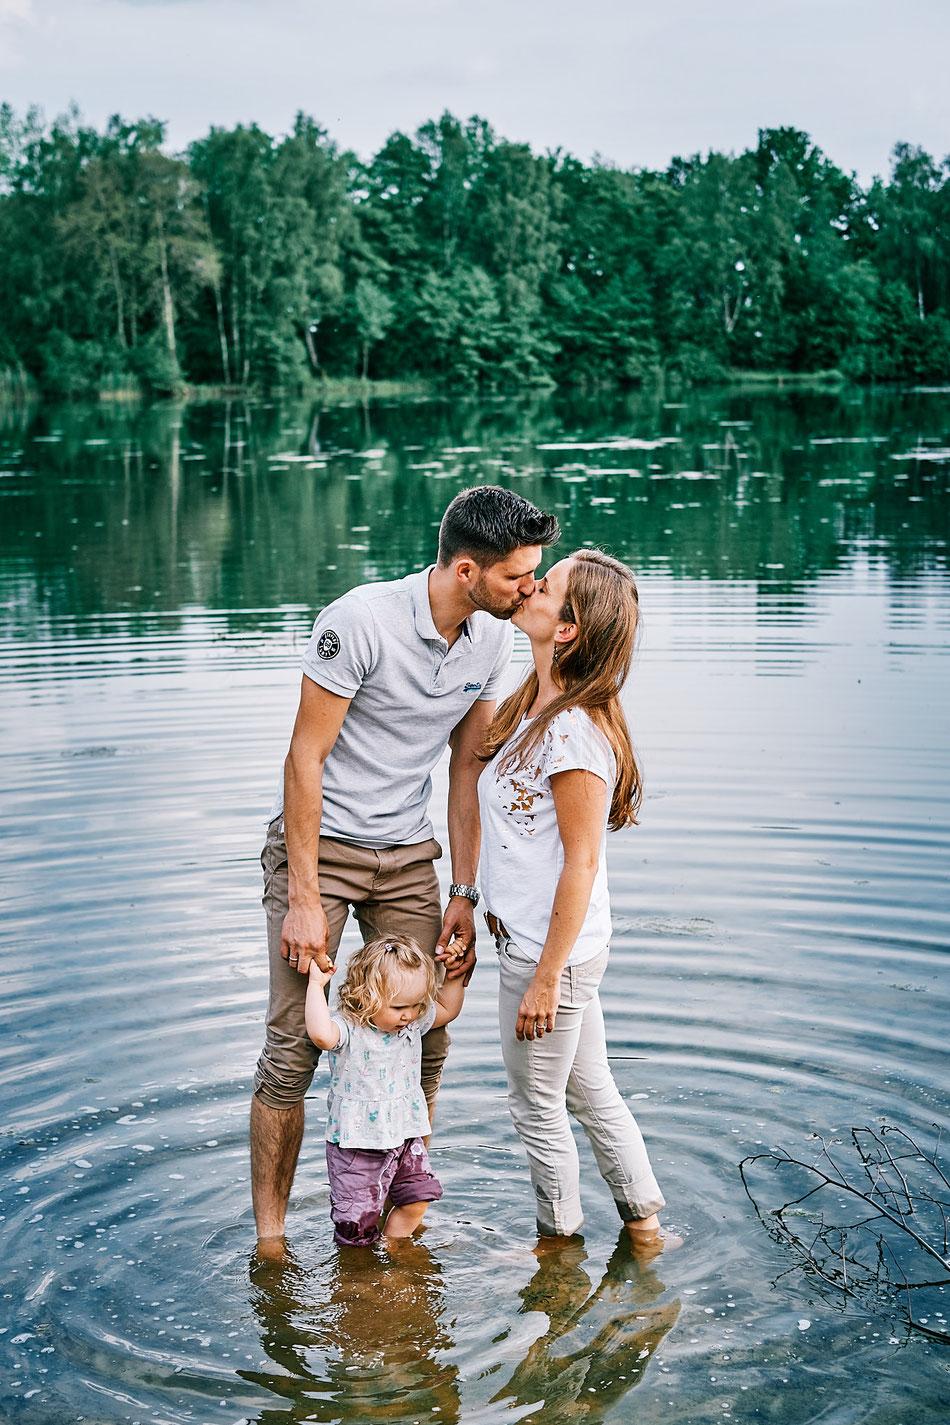 Familien-Shooting Verden, Familienfotos Achim,Familienfotos, Familienfotografie, Familienfotograf, Fotoshooting Familie draussen, Bremen, Langwedel, Verden, Achim, Outdoor